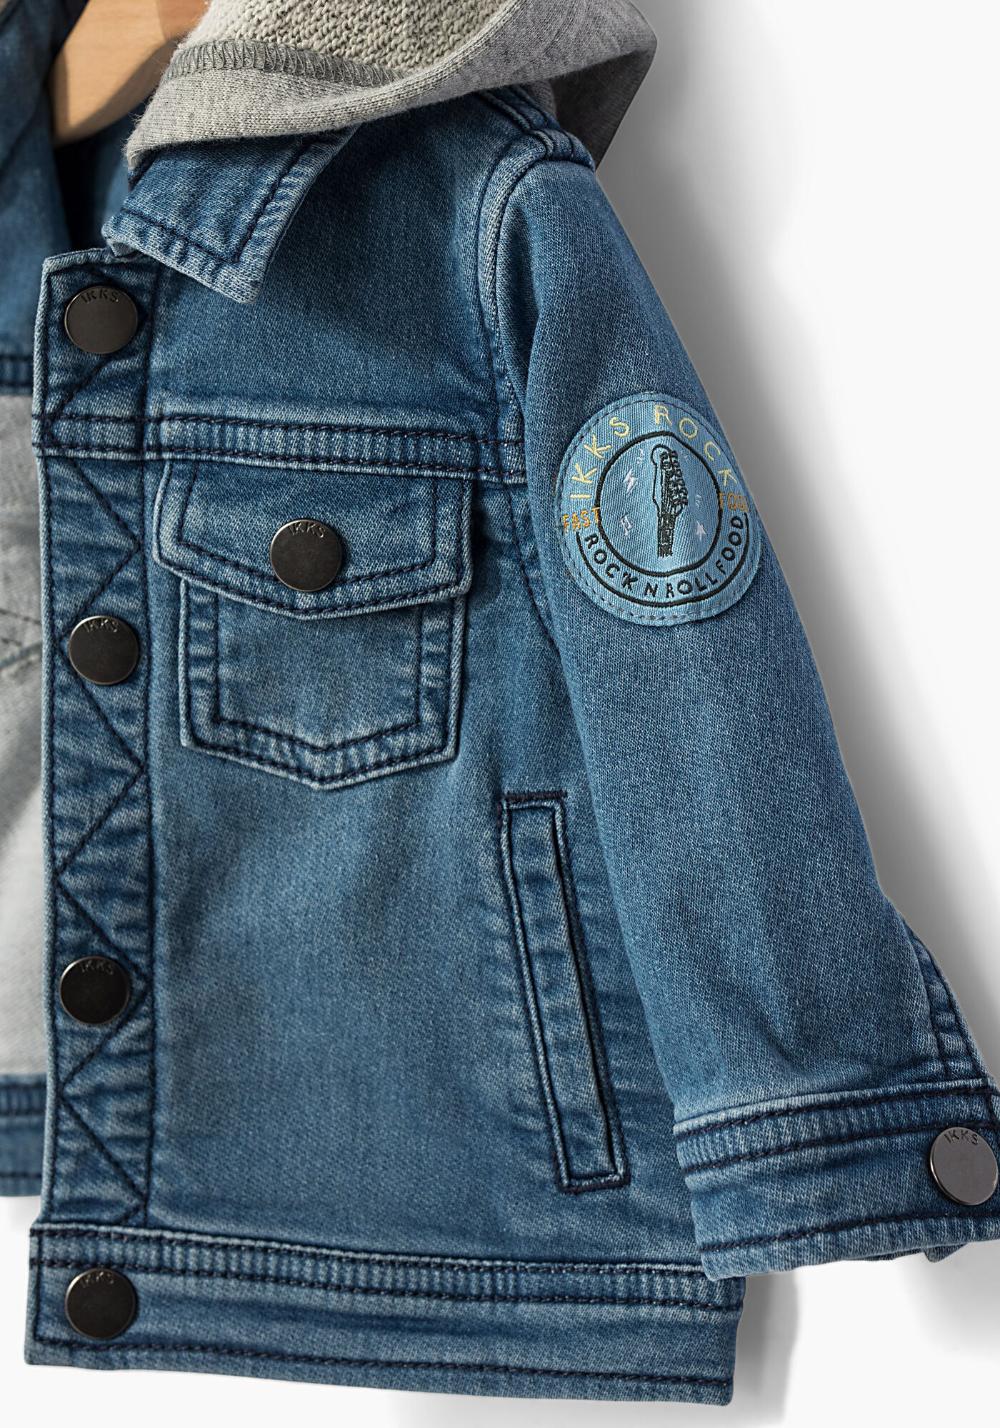 Ikks Summer Sale Baby Boys Stone Blue Denim Jacket Ikks Baby Clothes Denim Jacket Blue Denim Jackets [ 1428 x 1000 Pixel ]